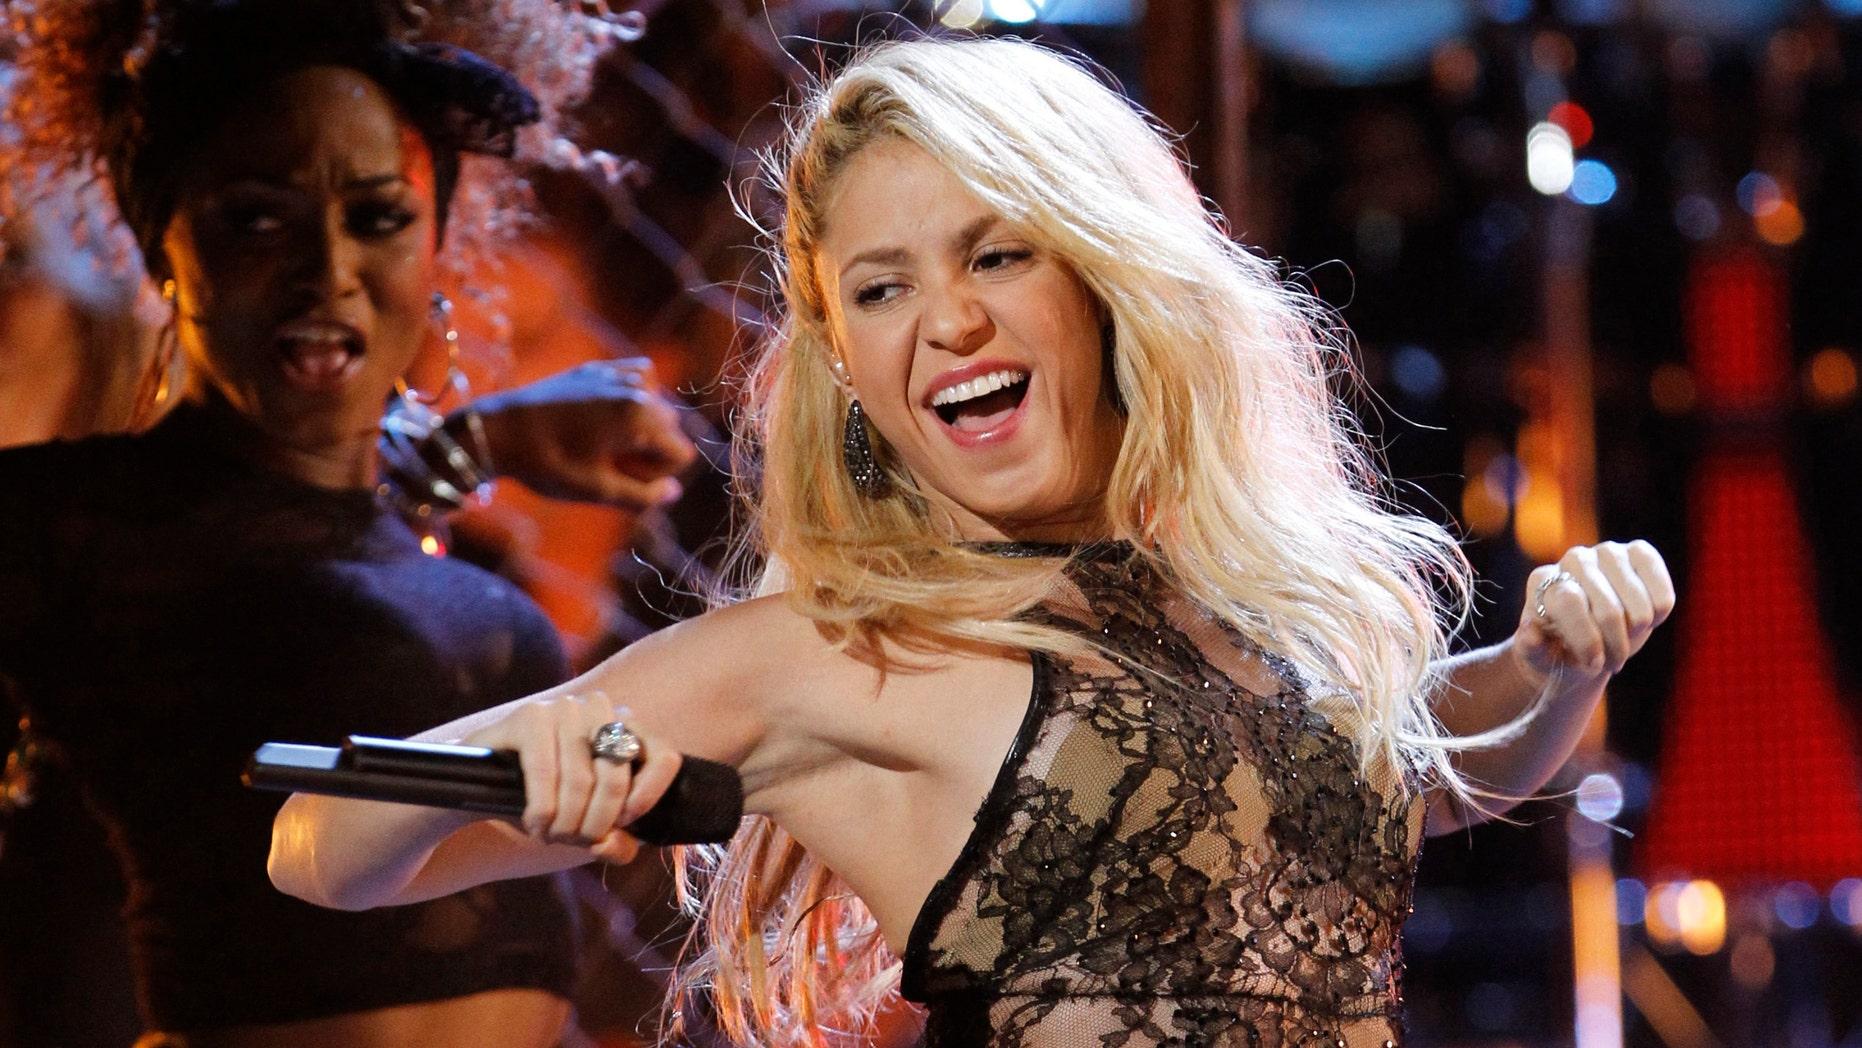 Colombian singer Shakira performs in Las Vegas, Nevada, November 10, 2011. (REUTERS/Mario Anzuoni)